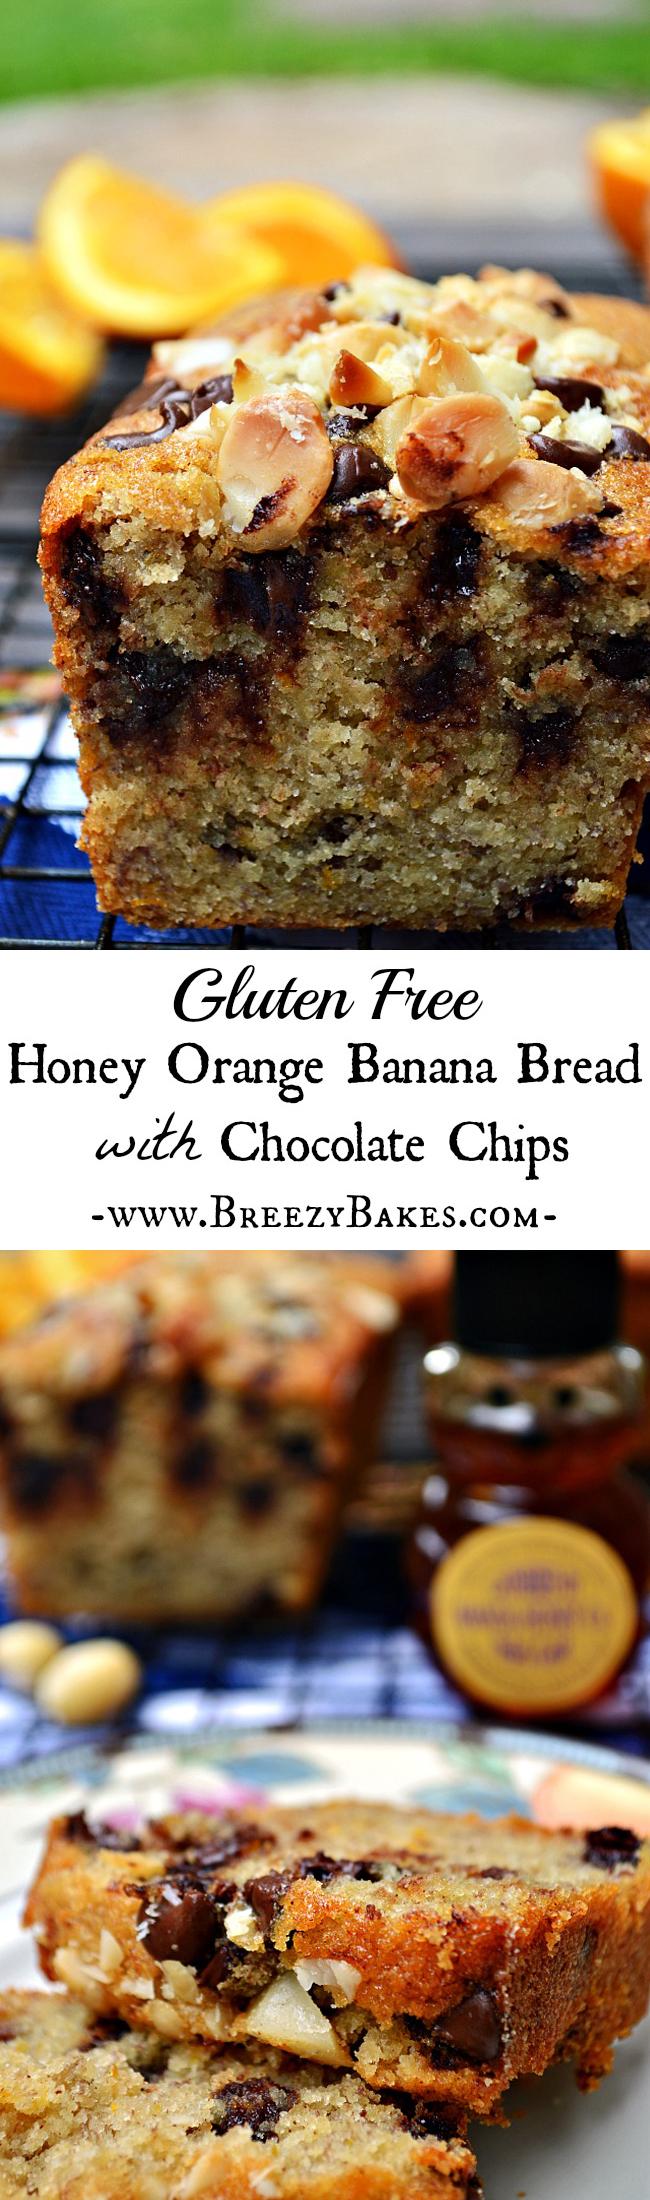 Gluten Free Honey Orange Banana Bread with Chocolate Chips ...